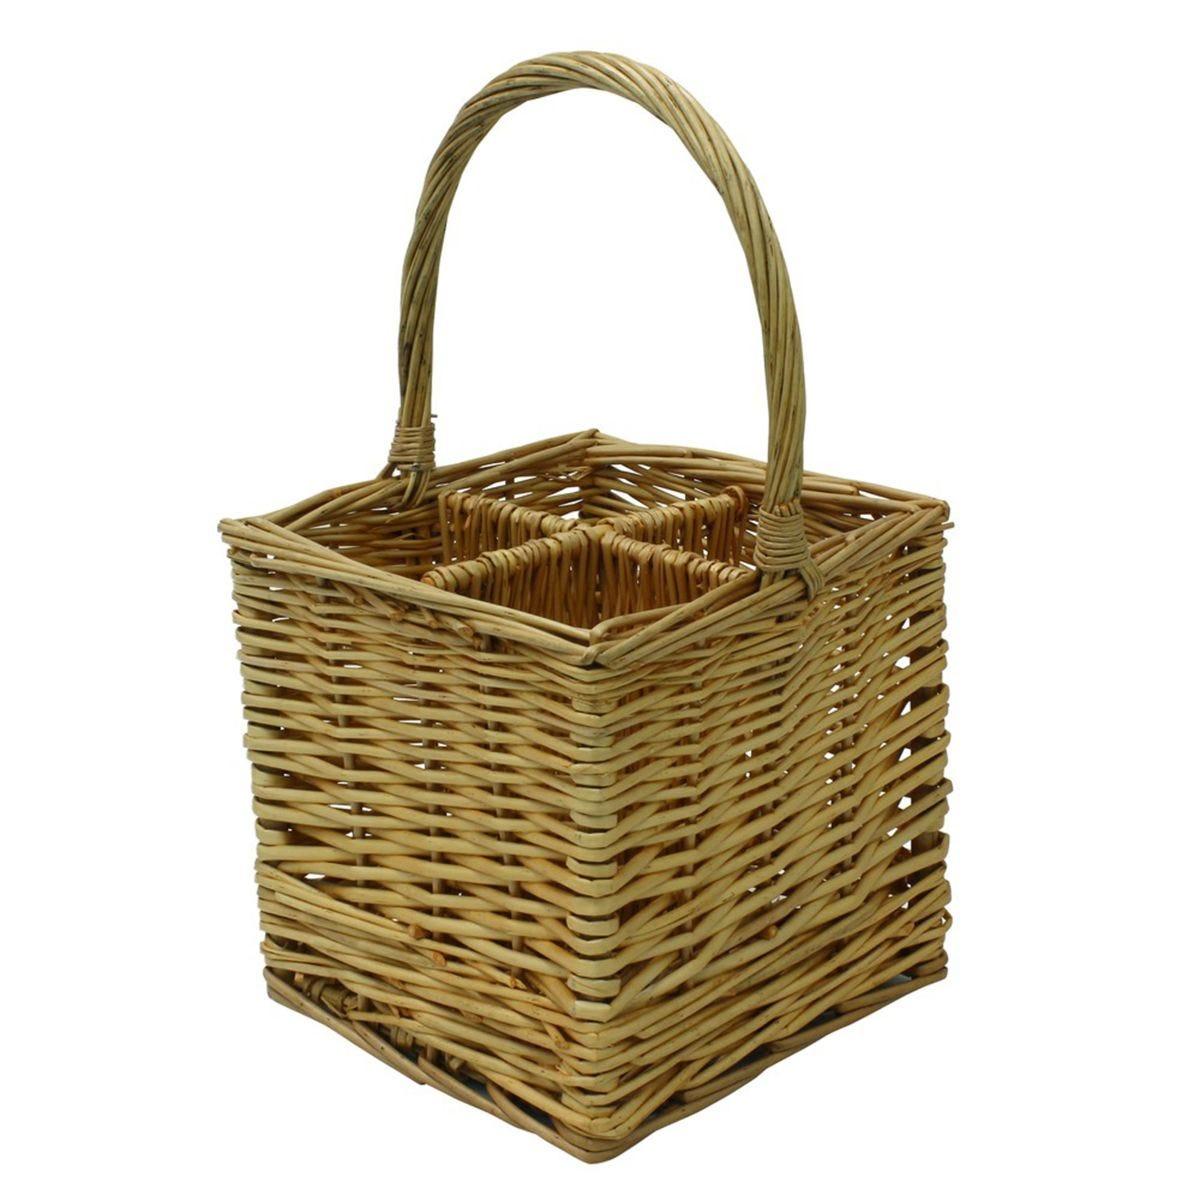 JVL Four Bottle Steamed Willow Wicker Wine Drinks Gift Basket Holder Carrier 25 x 25 x 44 cm